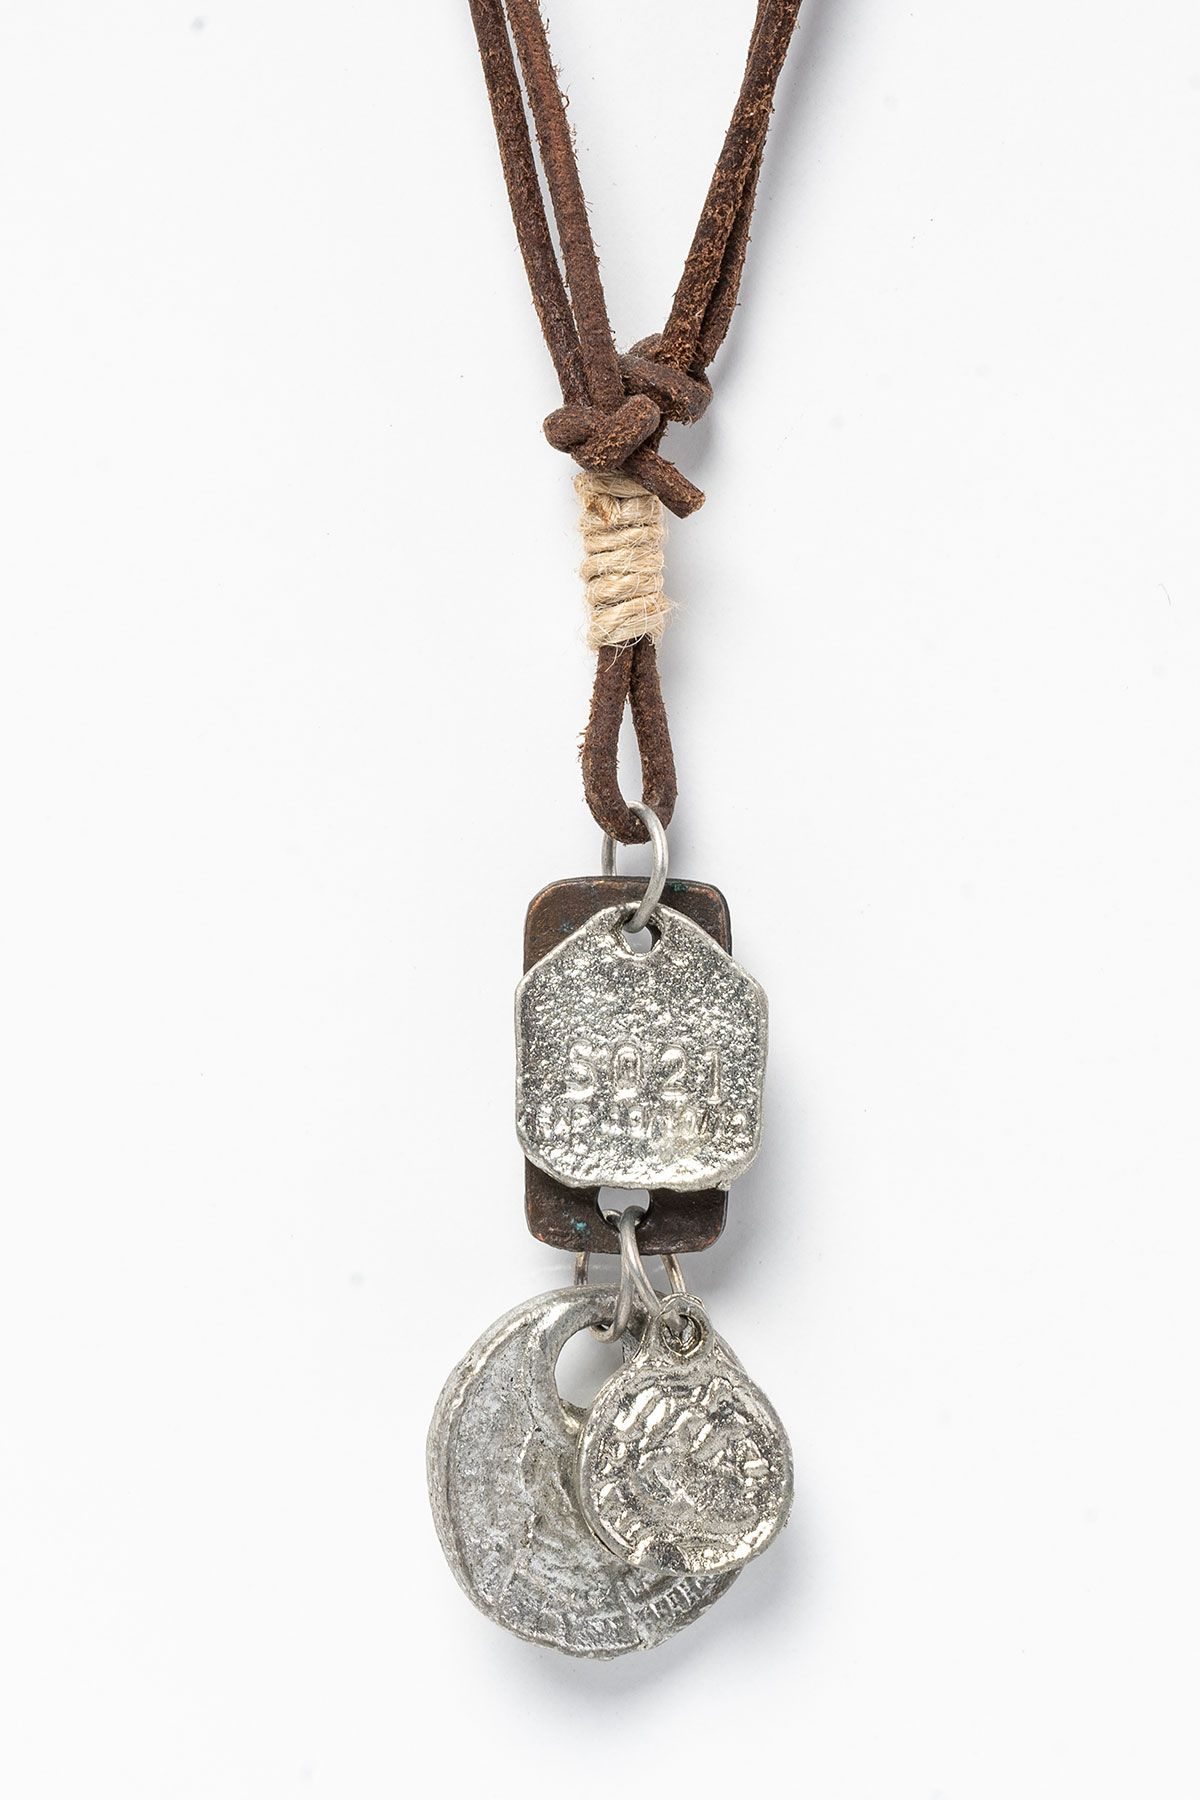 Pegia Genuine Leather Necklace 19KL15 Dark Brown